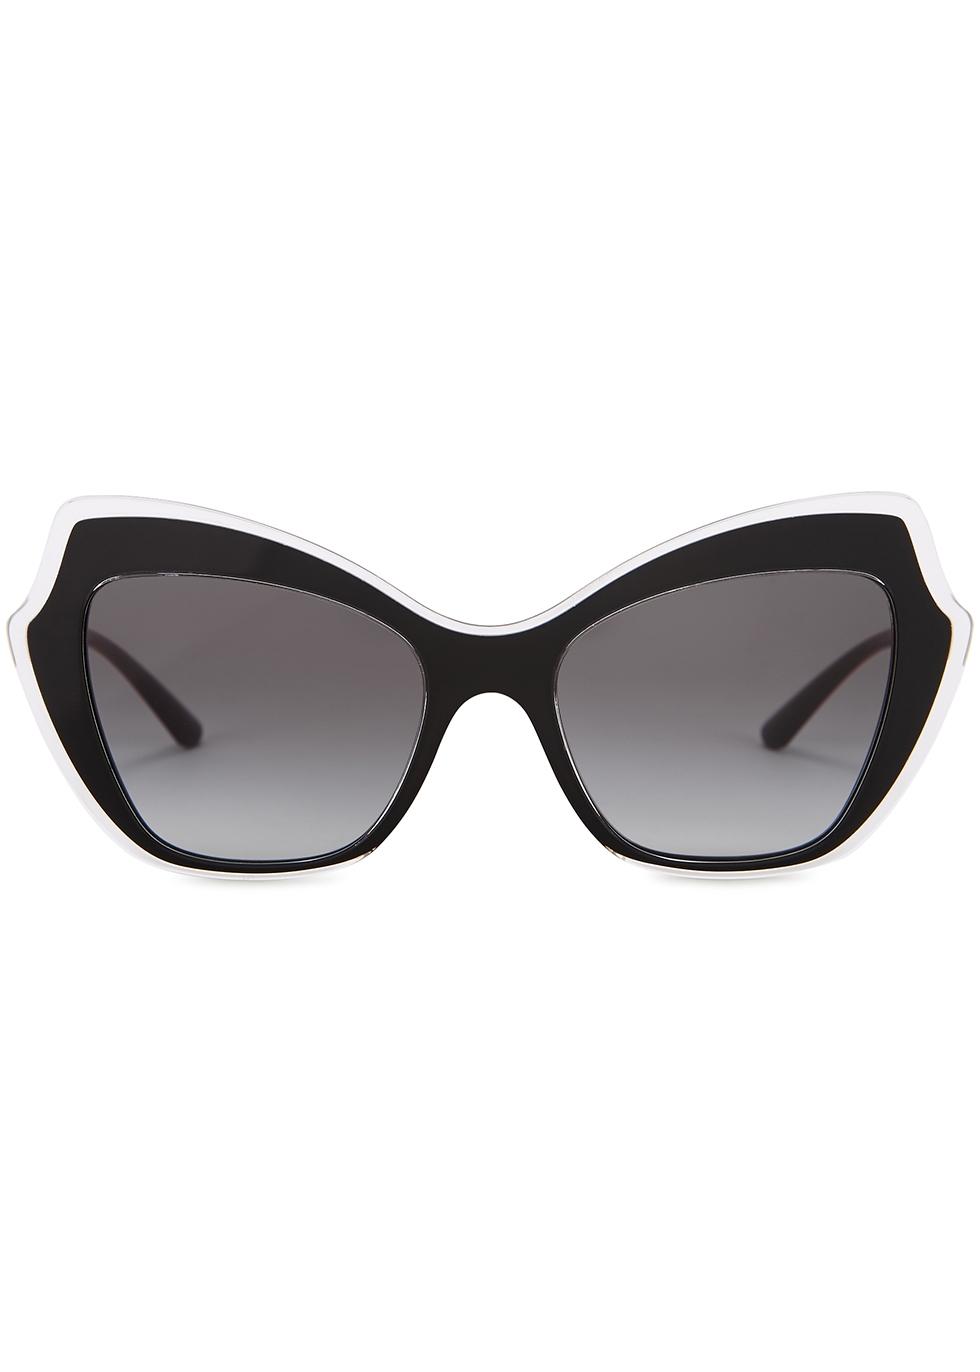 Black oversized cat-eye sunglasses - Dolce & Gabbana